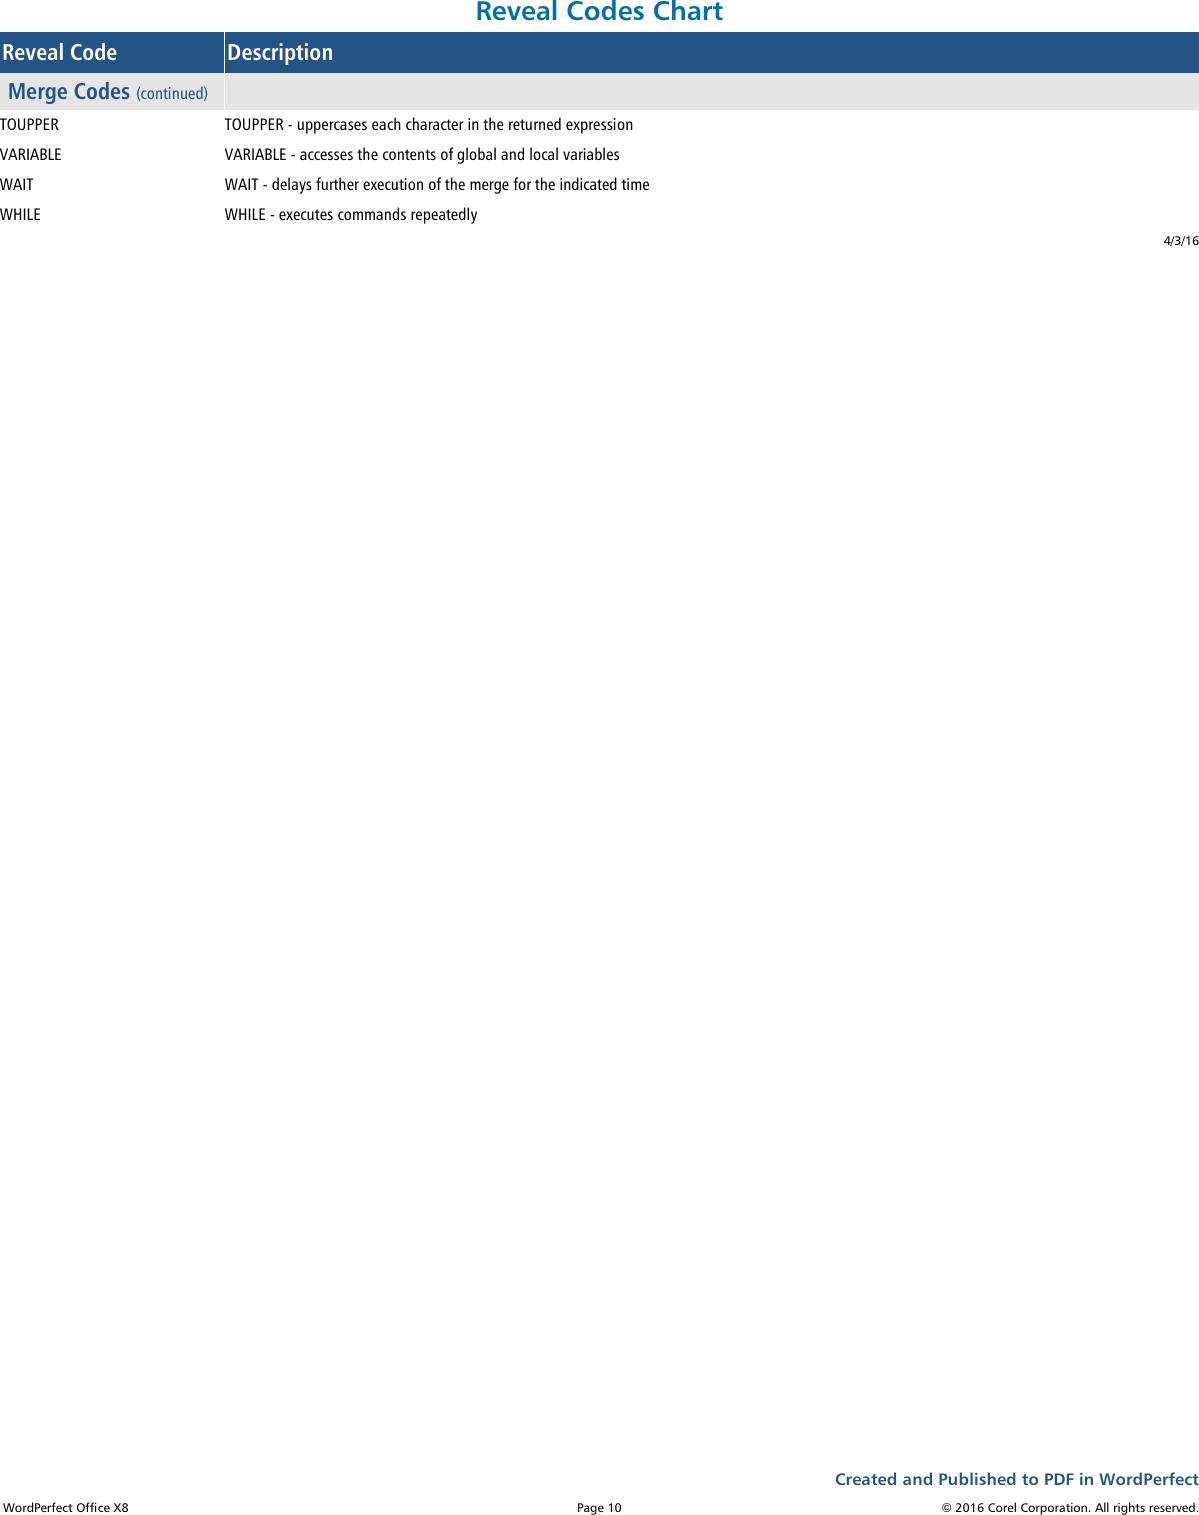 Corel WordPerfect Office Word Perfect X8 Reveal Codes Chart en